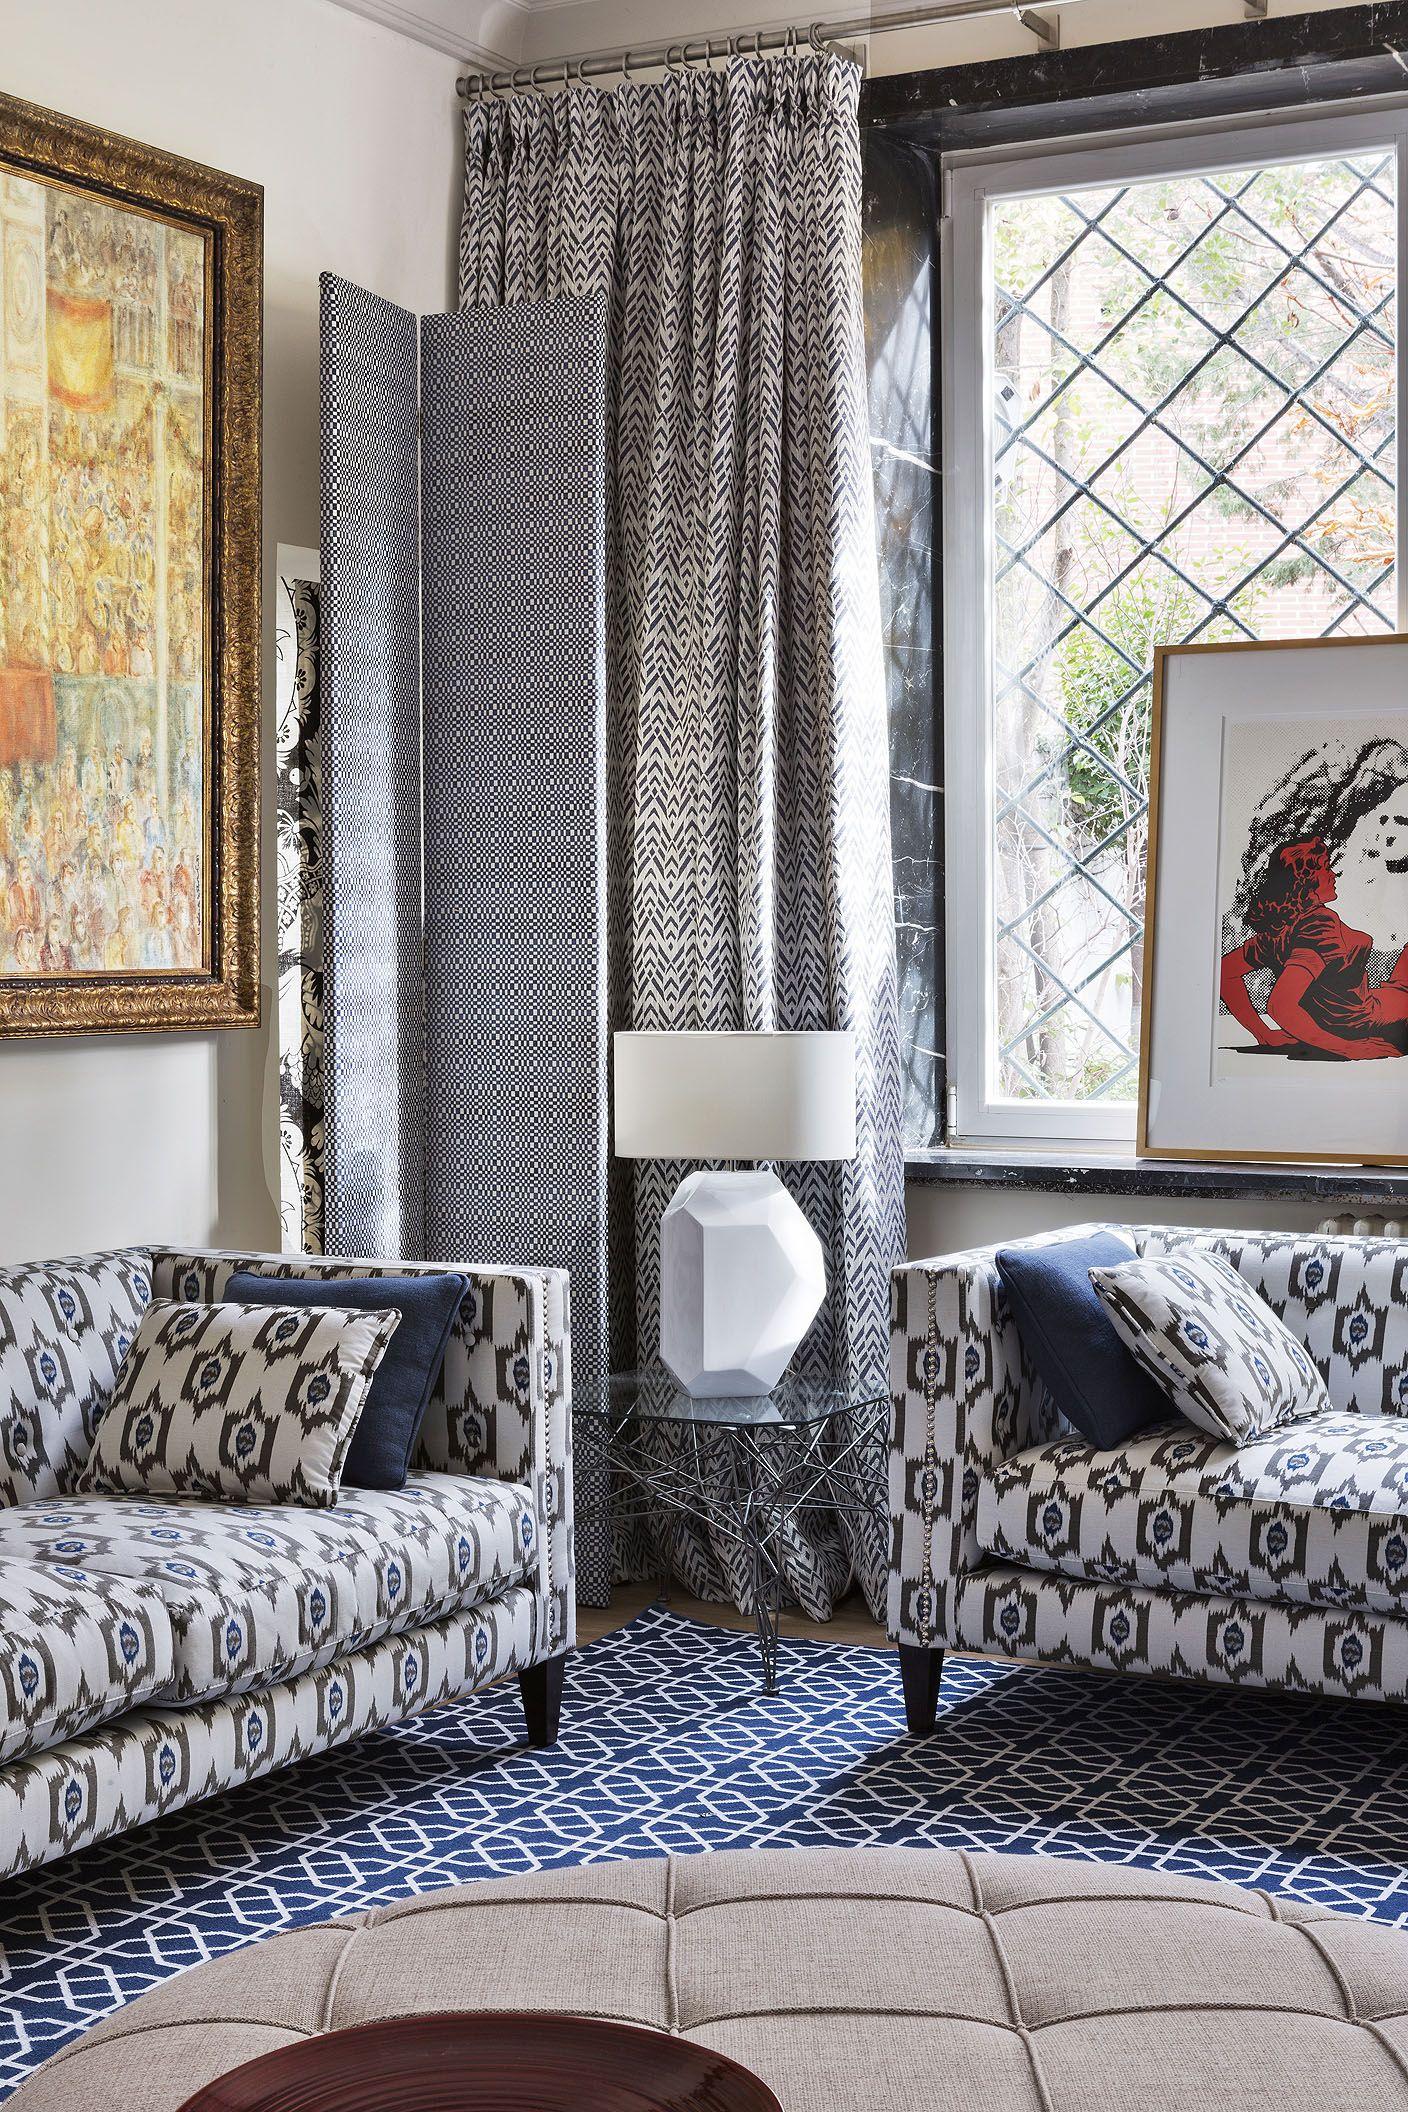 Colecci n madrid 2015 g d gaston y daniela pinterest decor colorful interiors and home - Gaston y daniela madrid ...